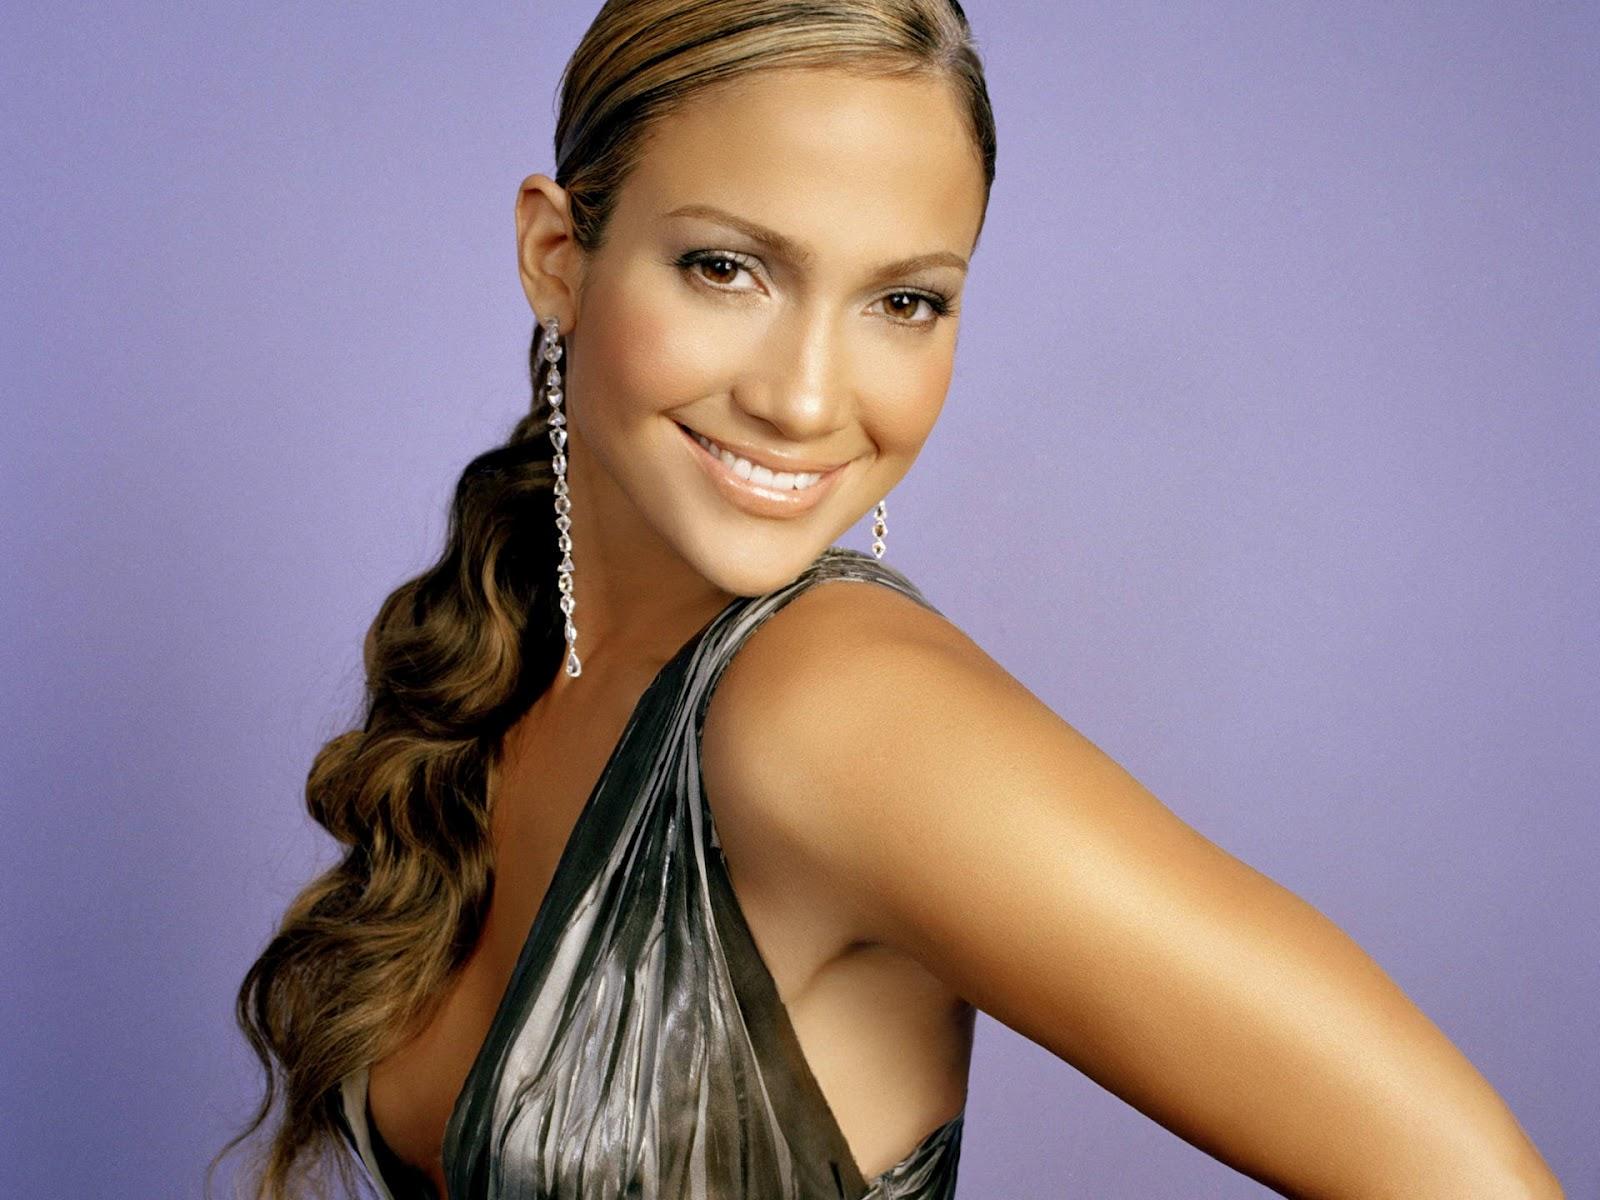 http://3.bp.blogspot.com/-nF4kpK-SIZE/T-Seglhn60I/AAAAAAAAD44/R0PrhvC22p8/s1600/Jennifer-Lopez-Wallpapers+_2012.jpg